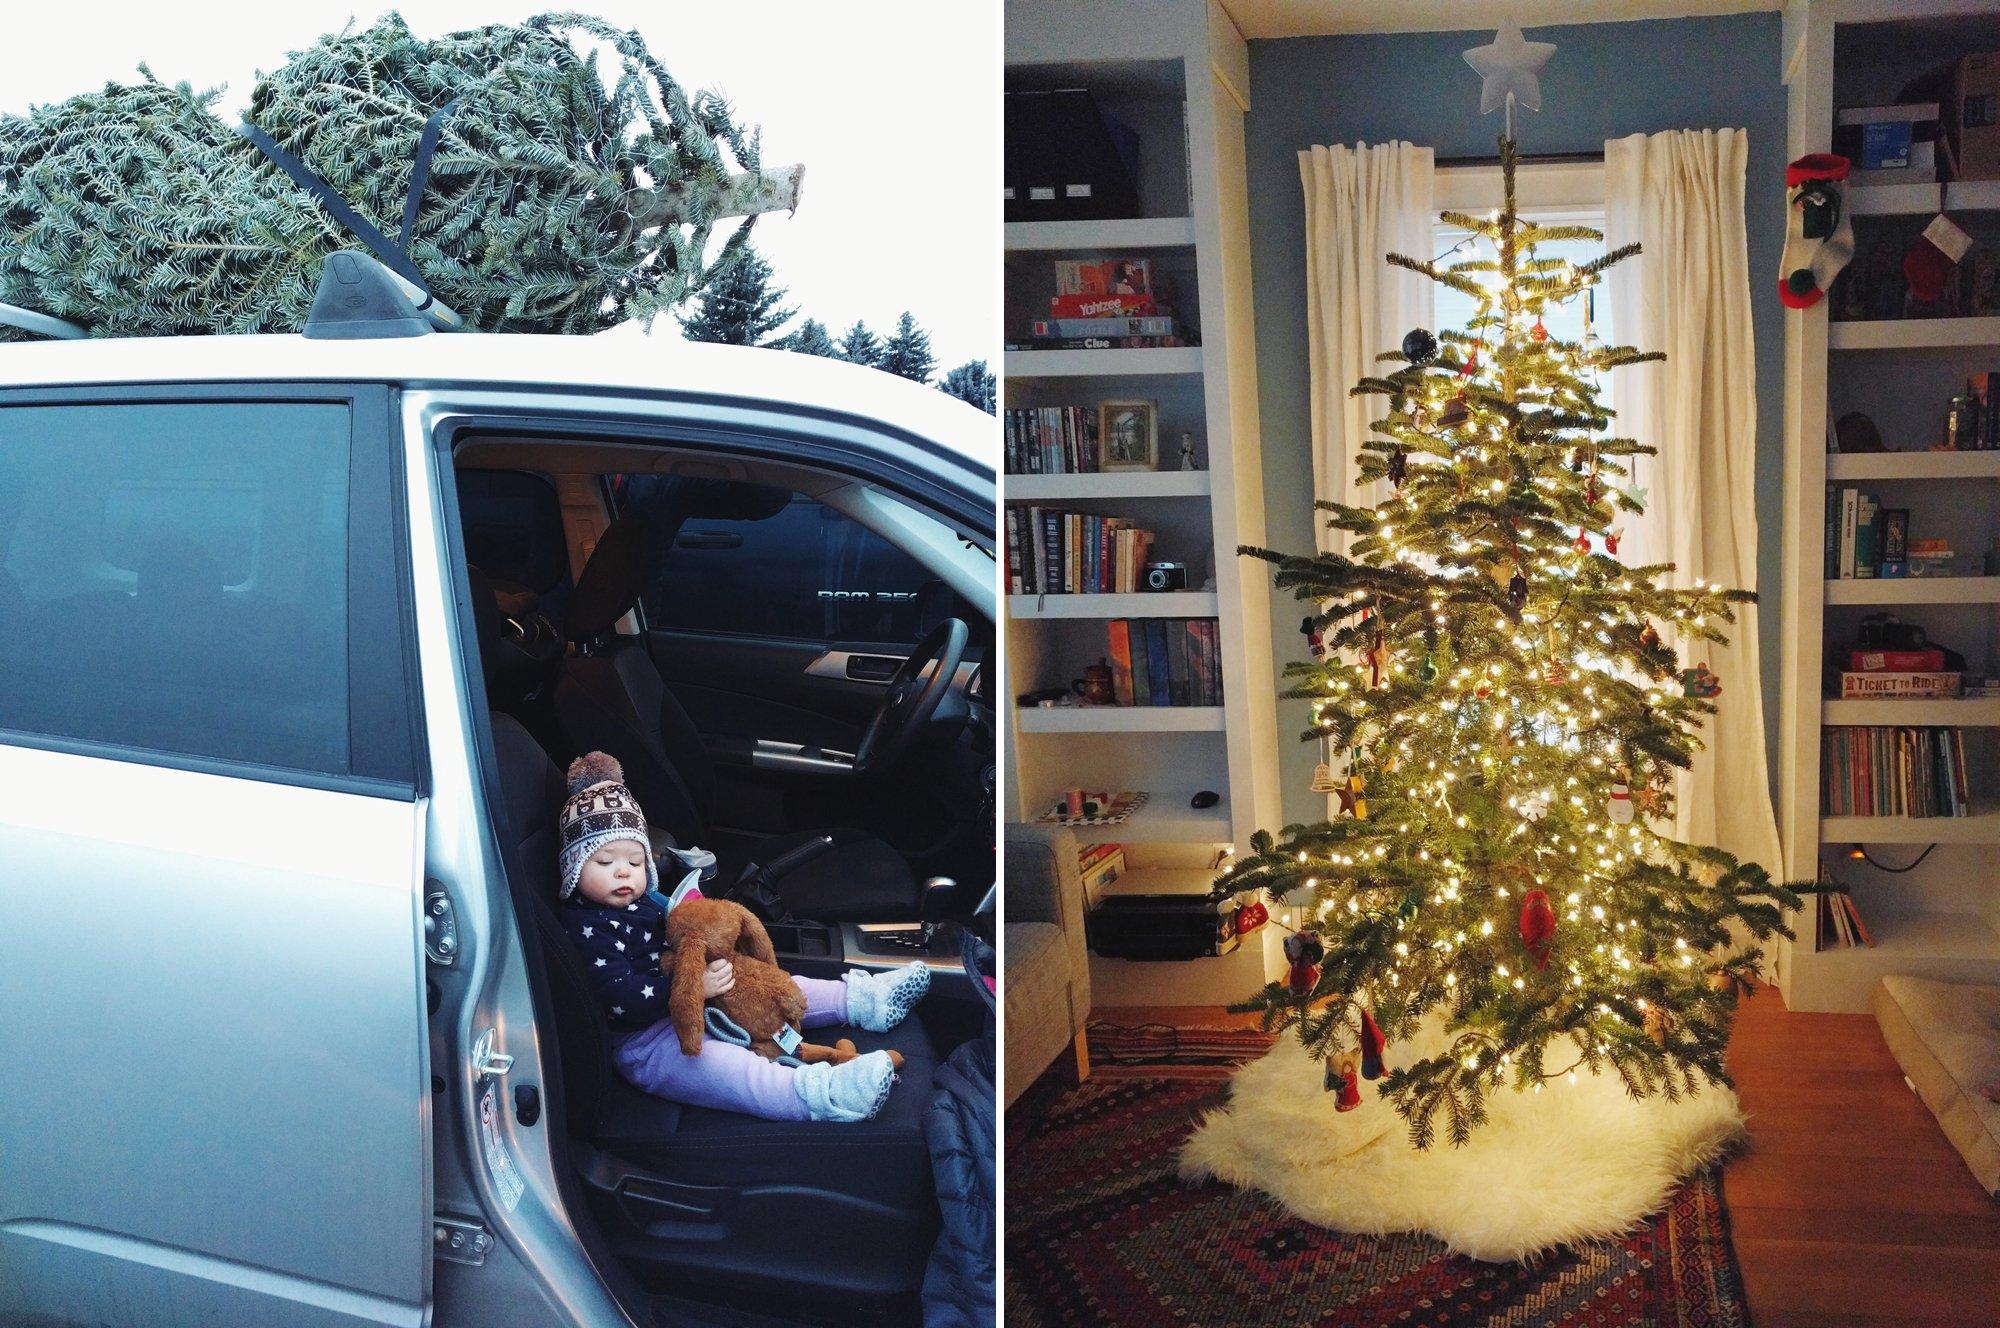 Christmas Tree from Greenbluff Spokane WA